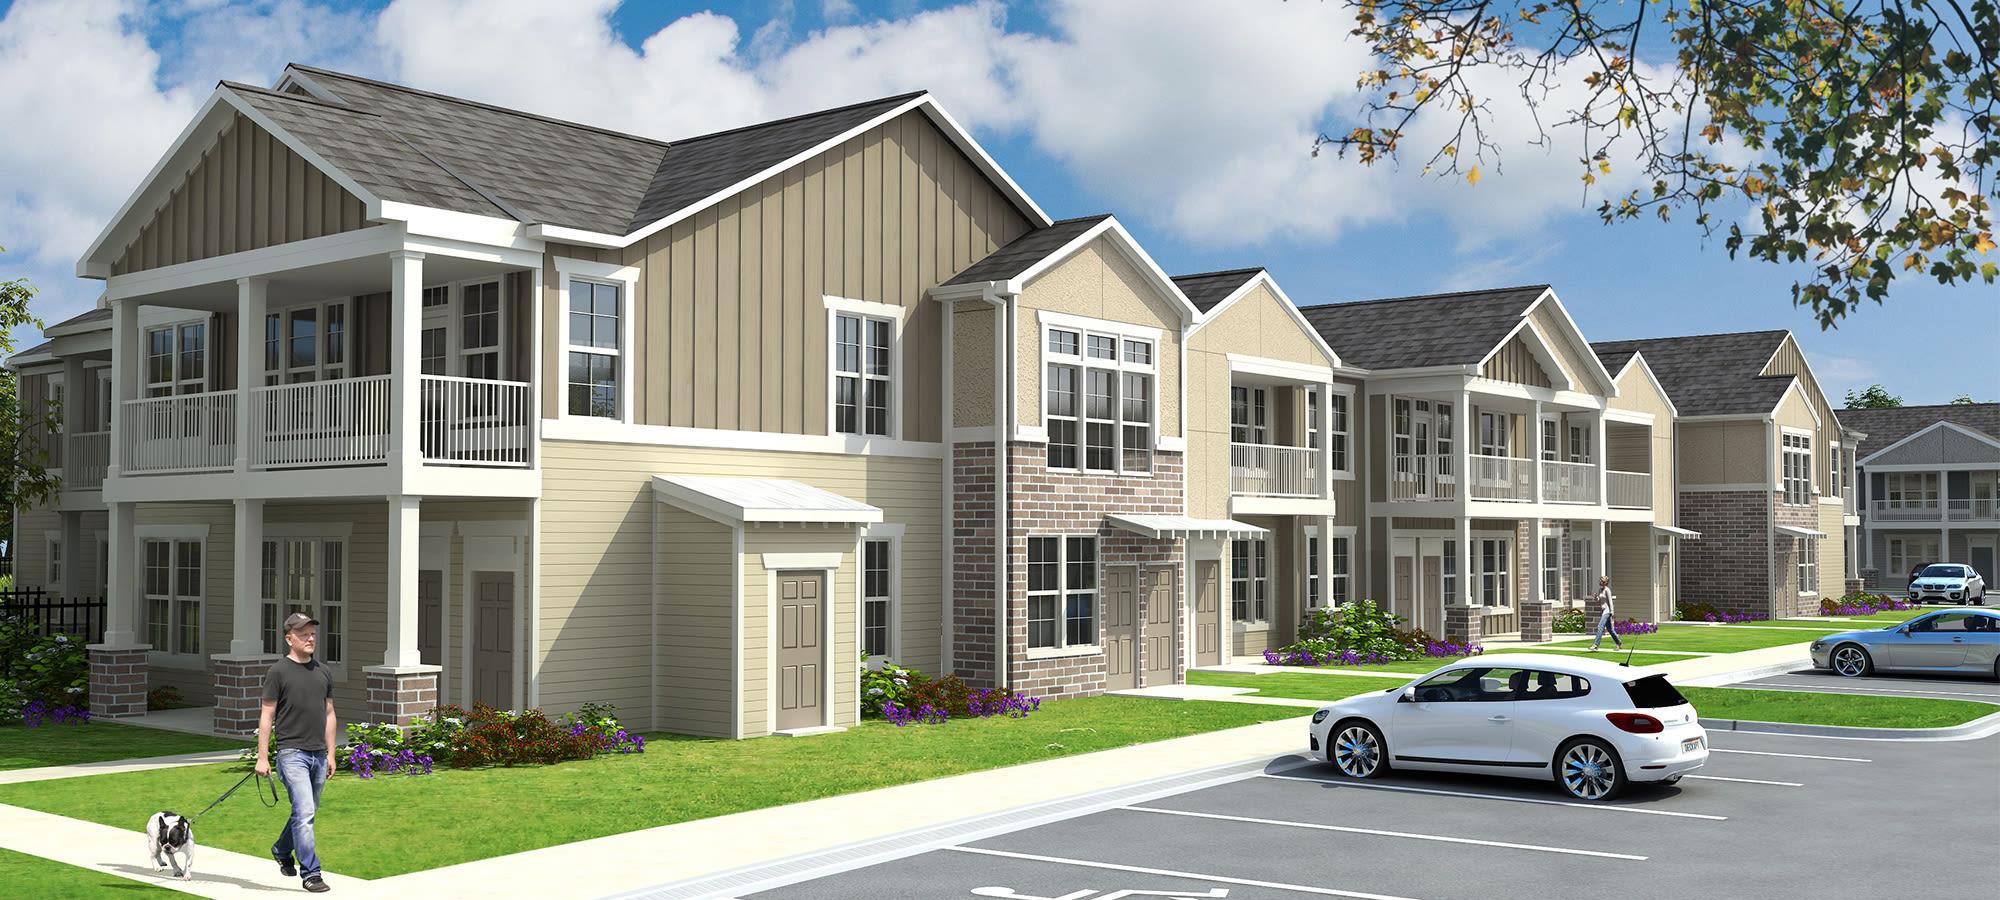 Apartments at Springs at La Grange in Louisville, Kentucky.